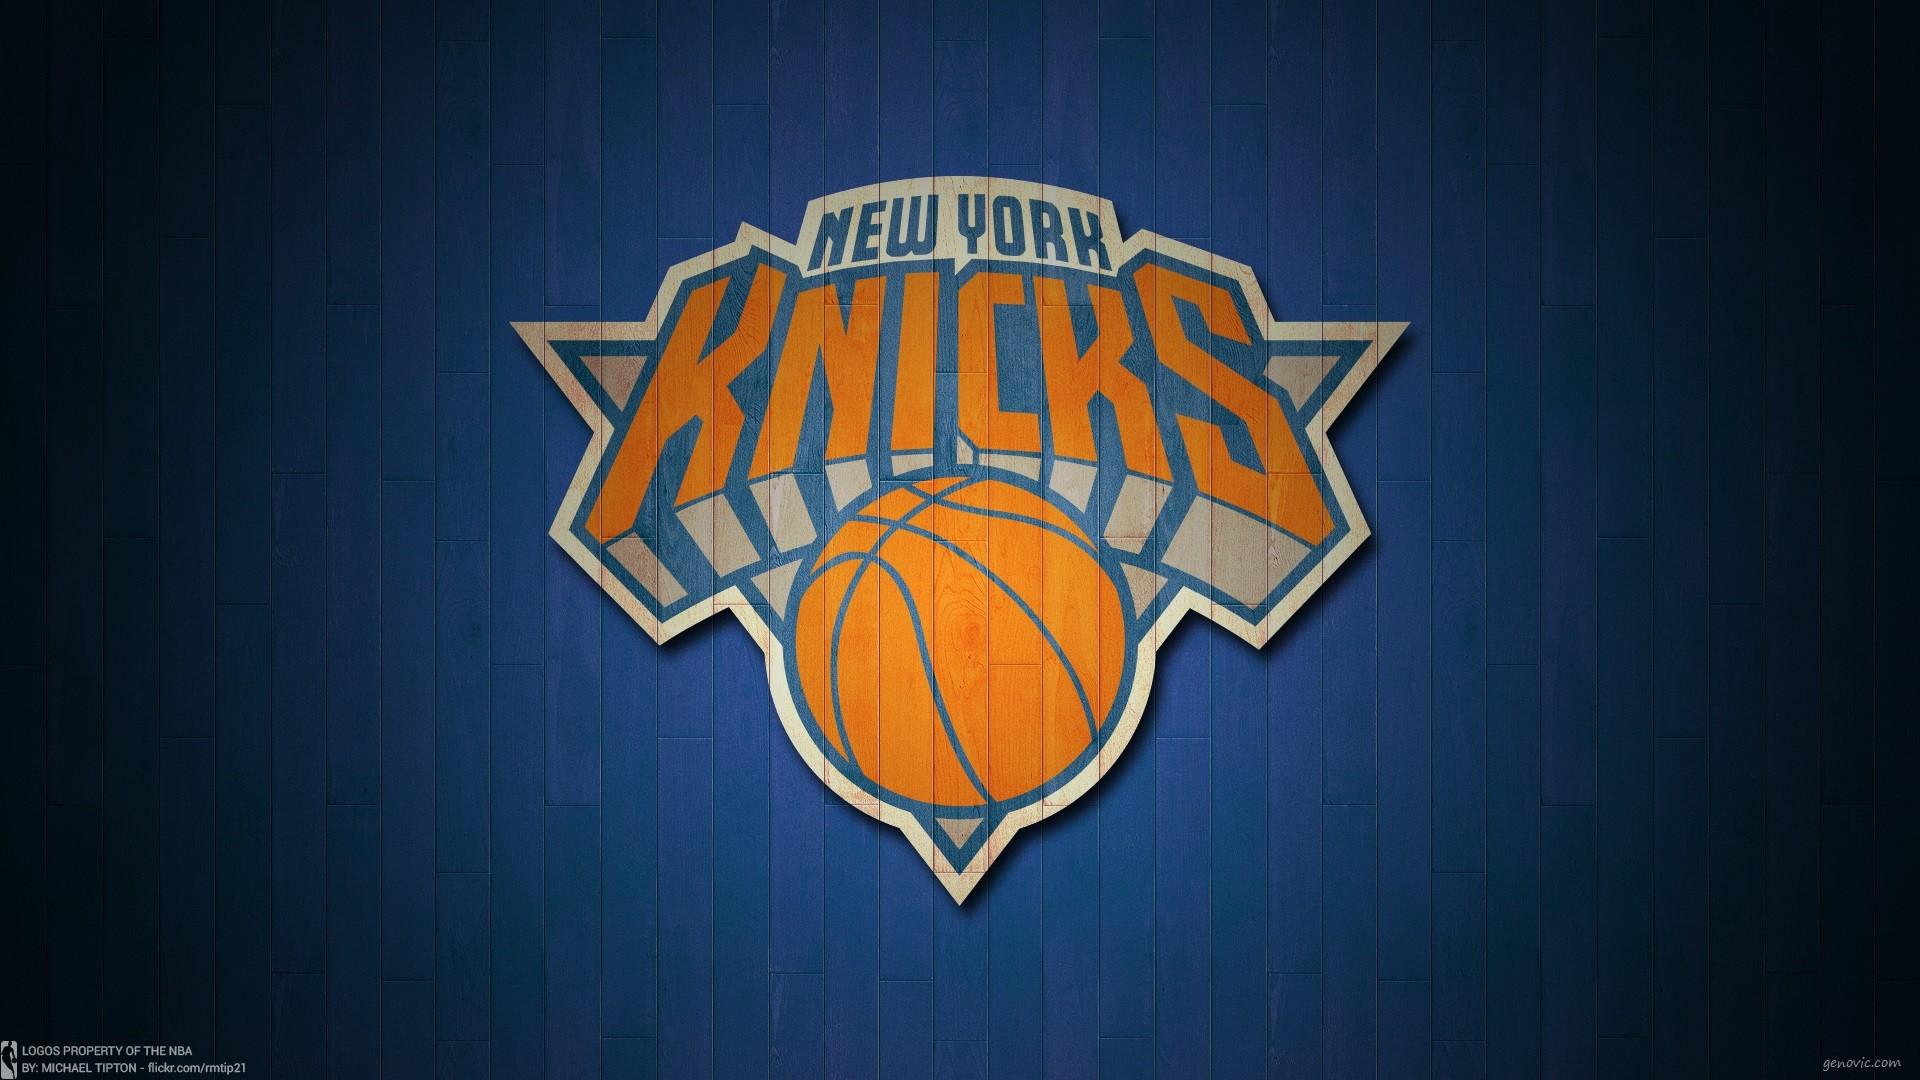 Res: 1920x1080, New York Knicks Wallpaper